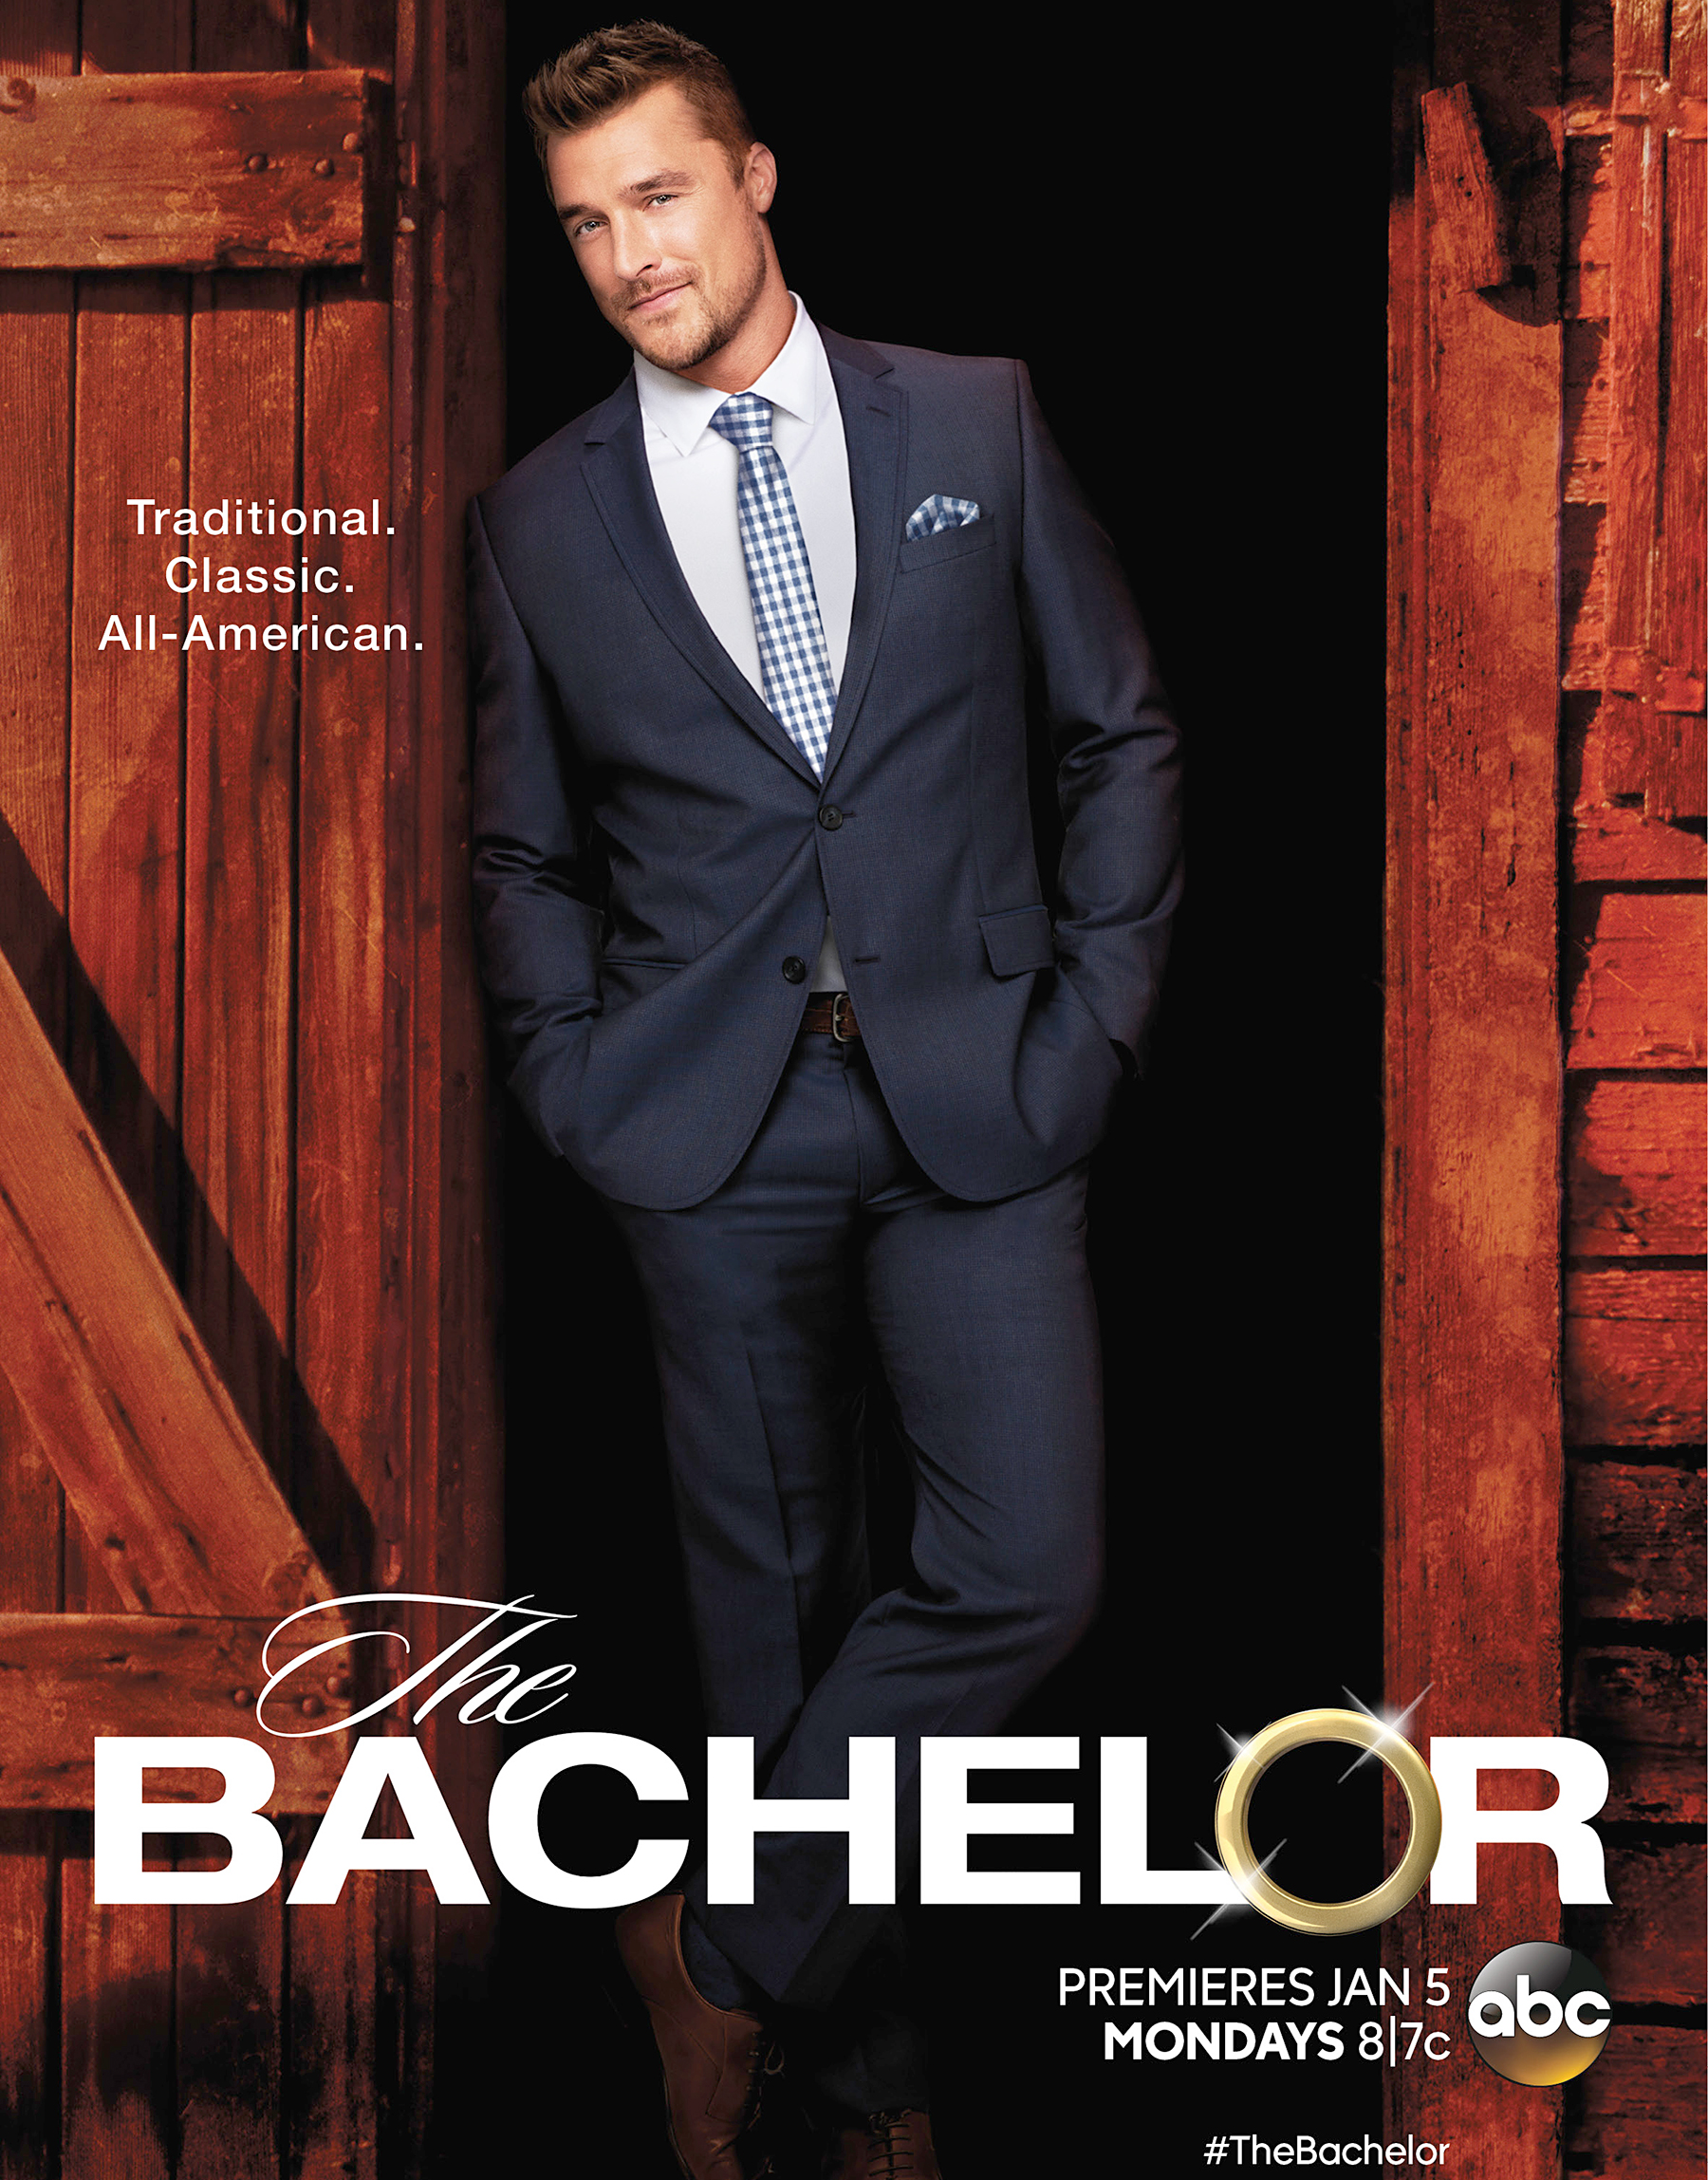 Classic movie bachelors paradise part 1 of 2 - 1 part 8